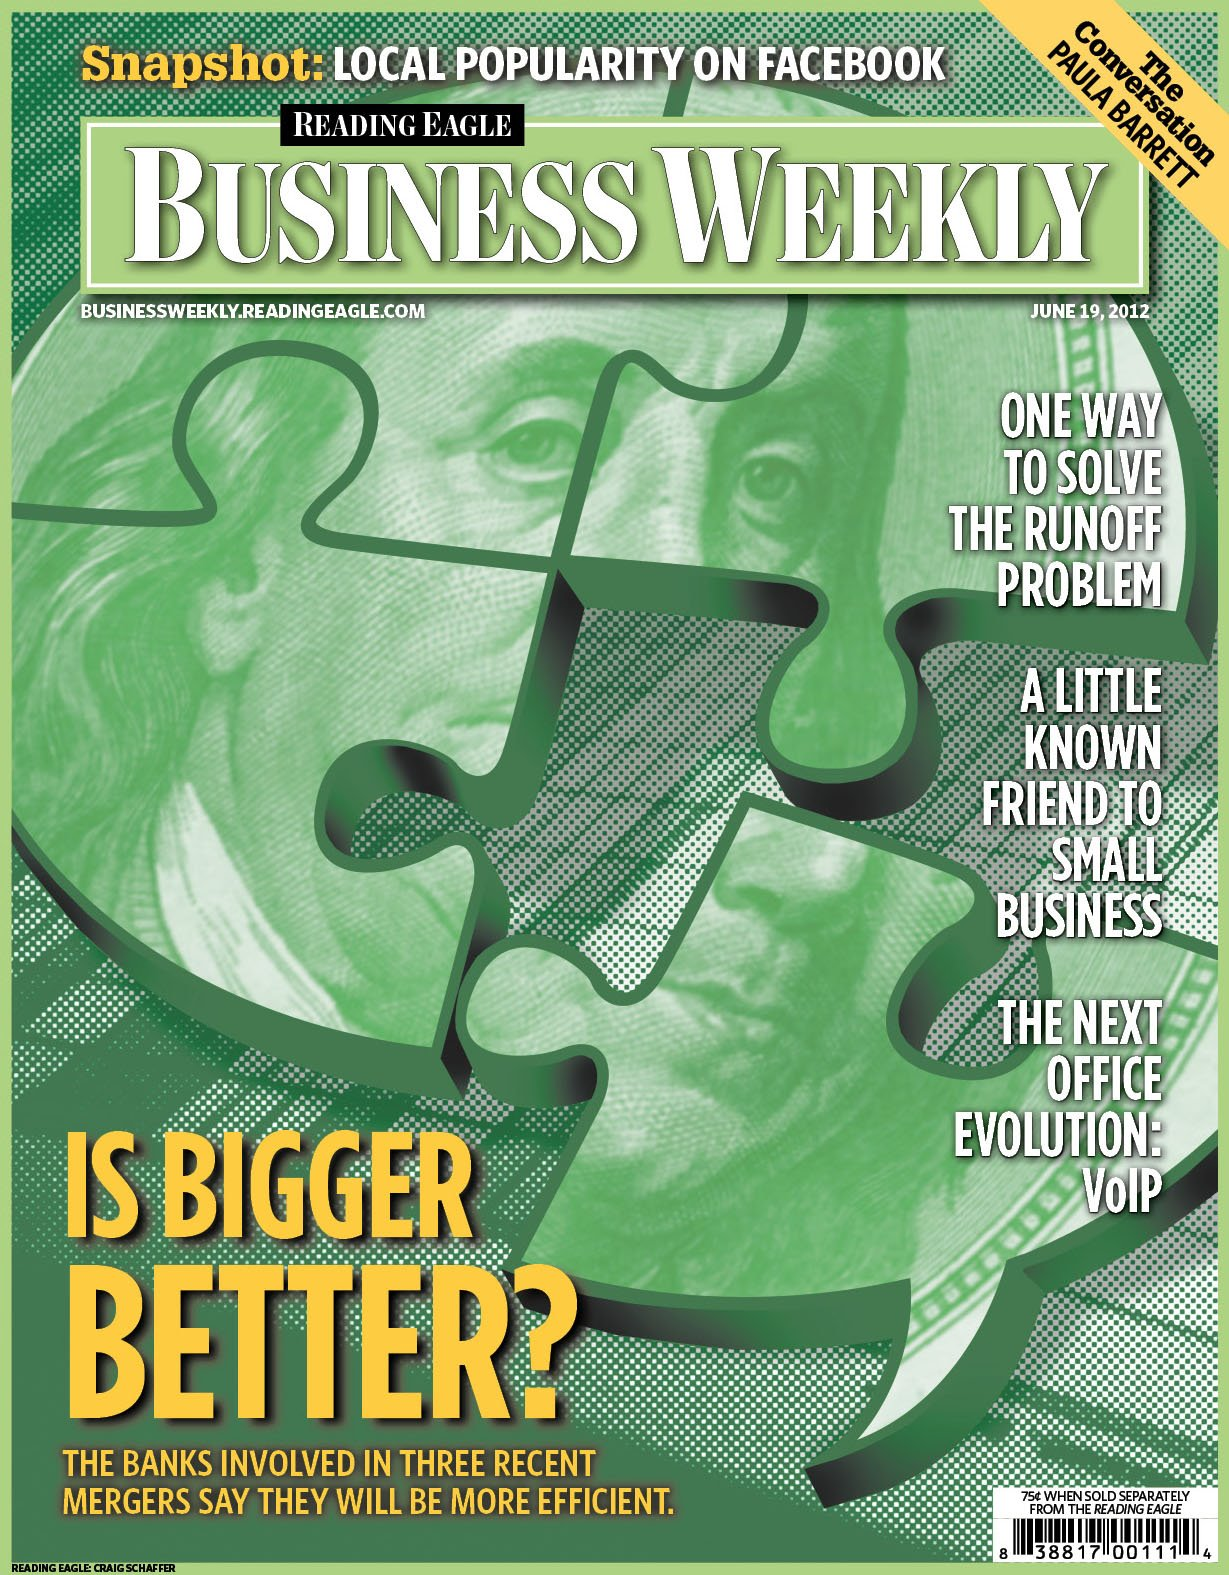 Bank mergers